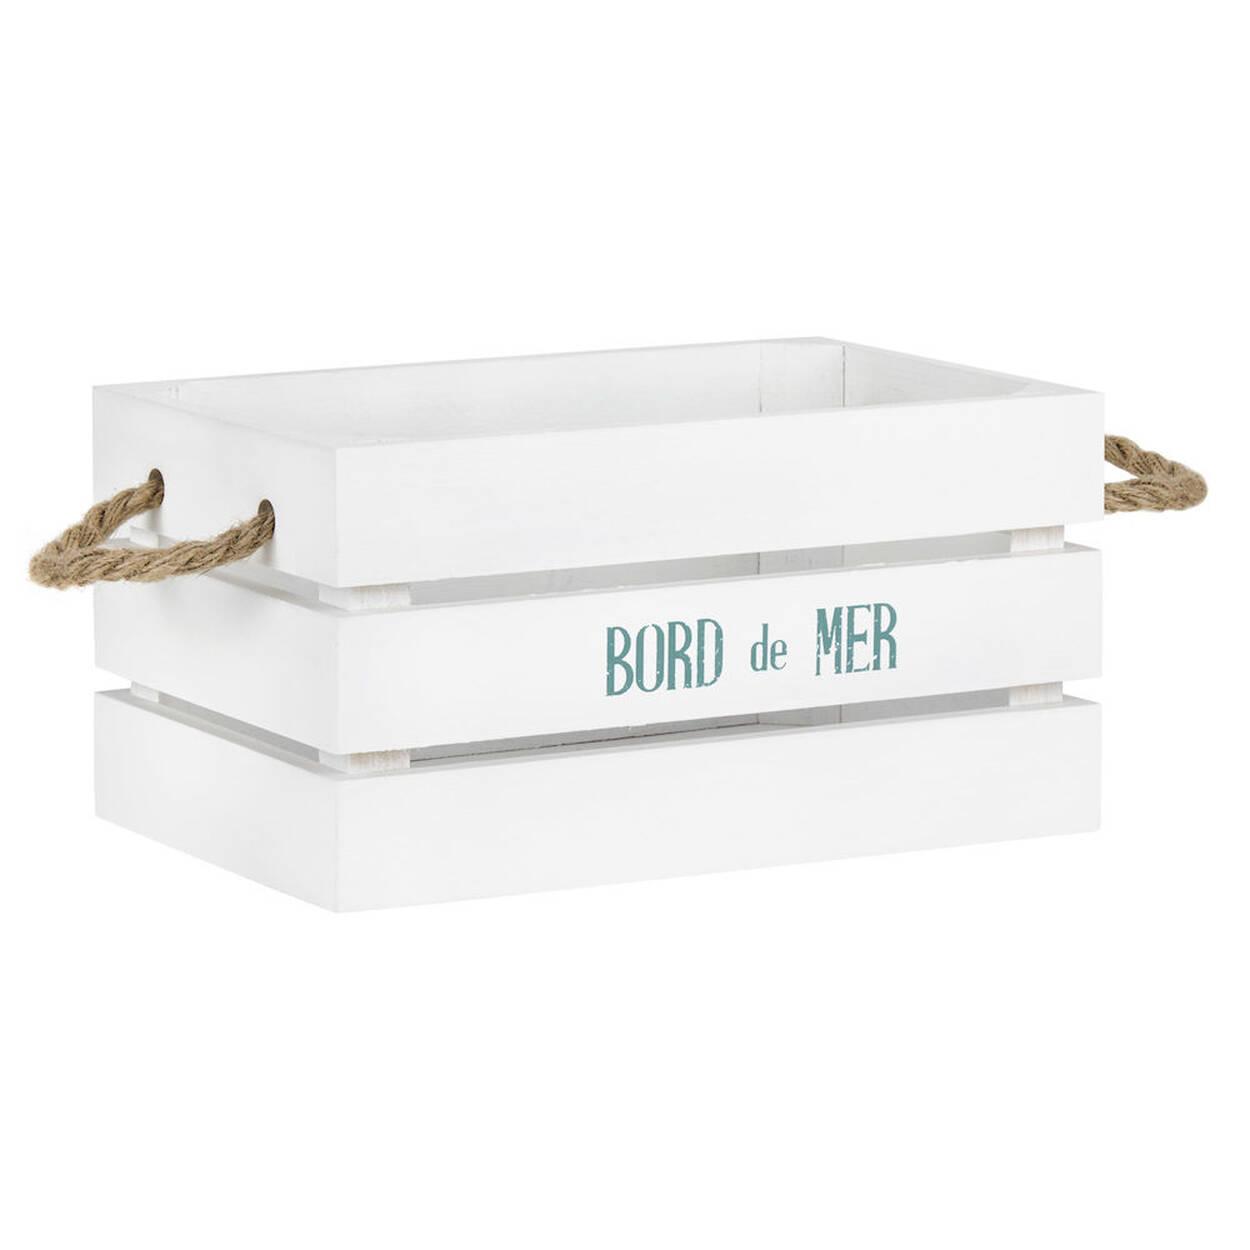 petite caisse en bois bord de mer. Black Bedroom Furniture Sets. Home Design Ideas